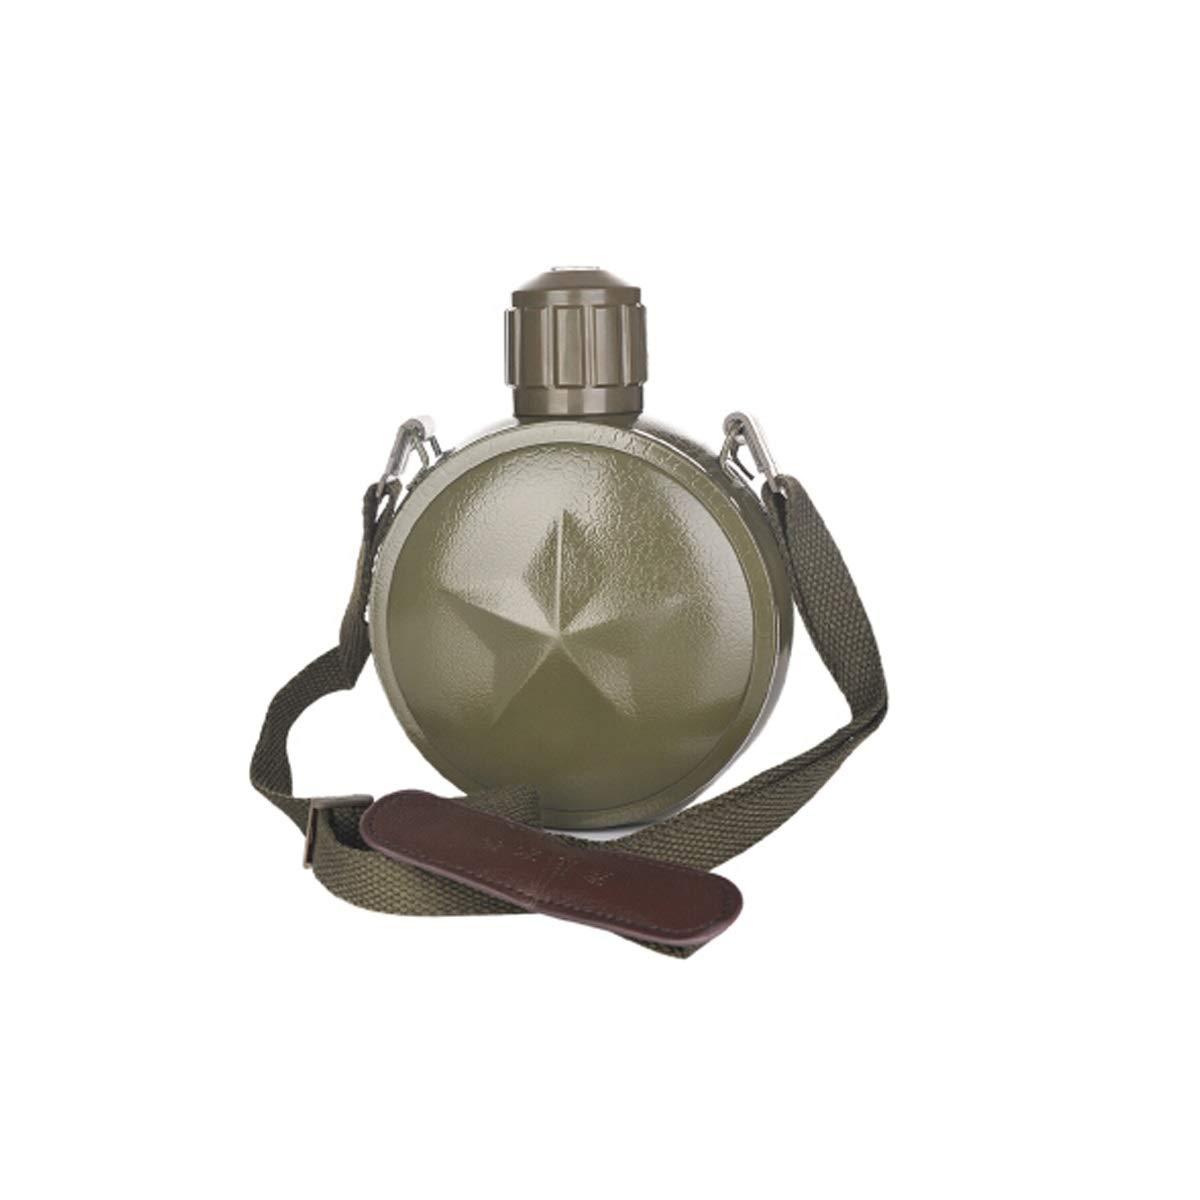 Tongboshi Retro Kettle, Large Capacity Mug, Outdoor Sports Mountaineering Travel Pot, Army Green 800ml (Capacity : 800ml, Color : Army Green)